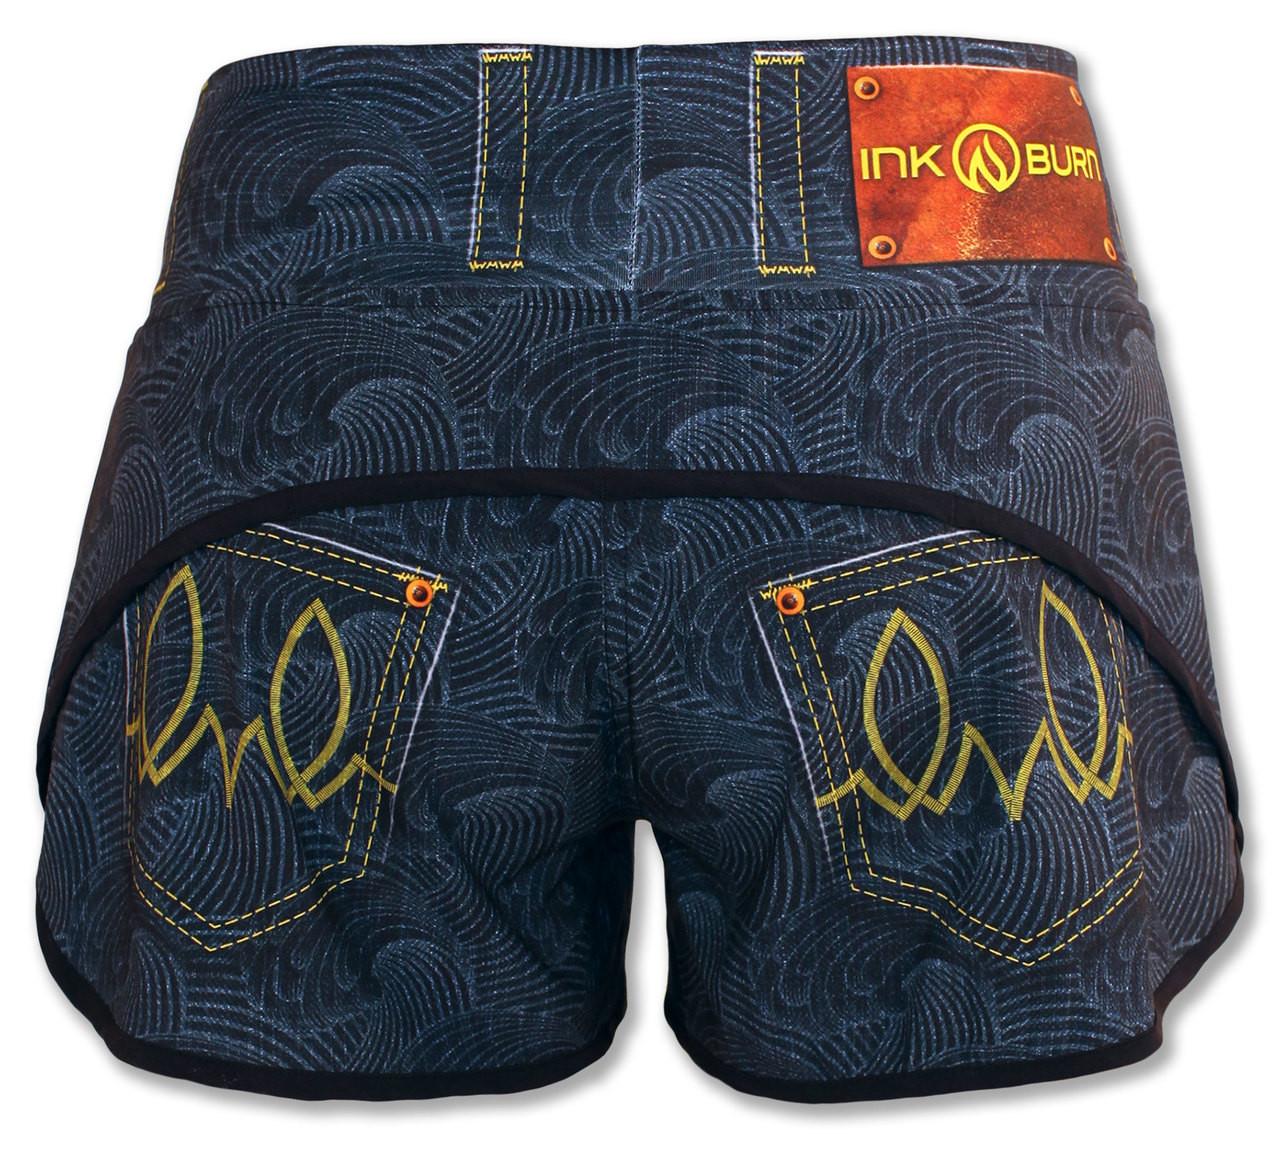 INKnBURN Women's Wave Denim Shorts Back